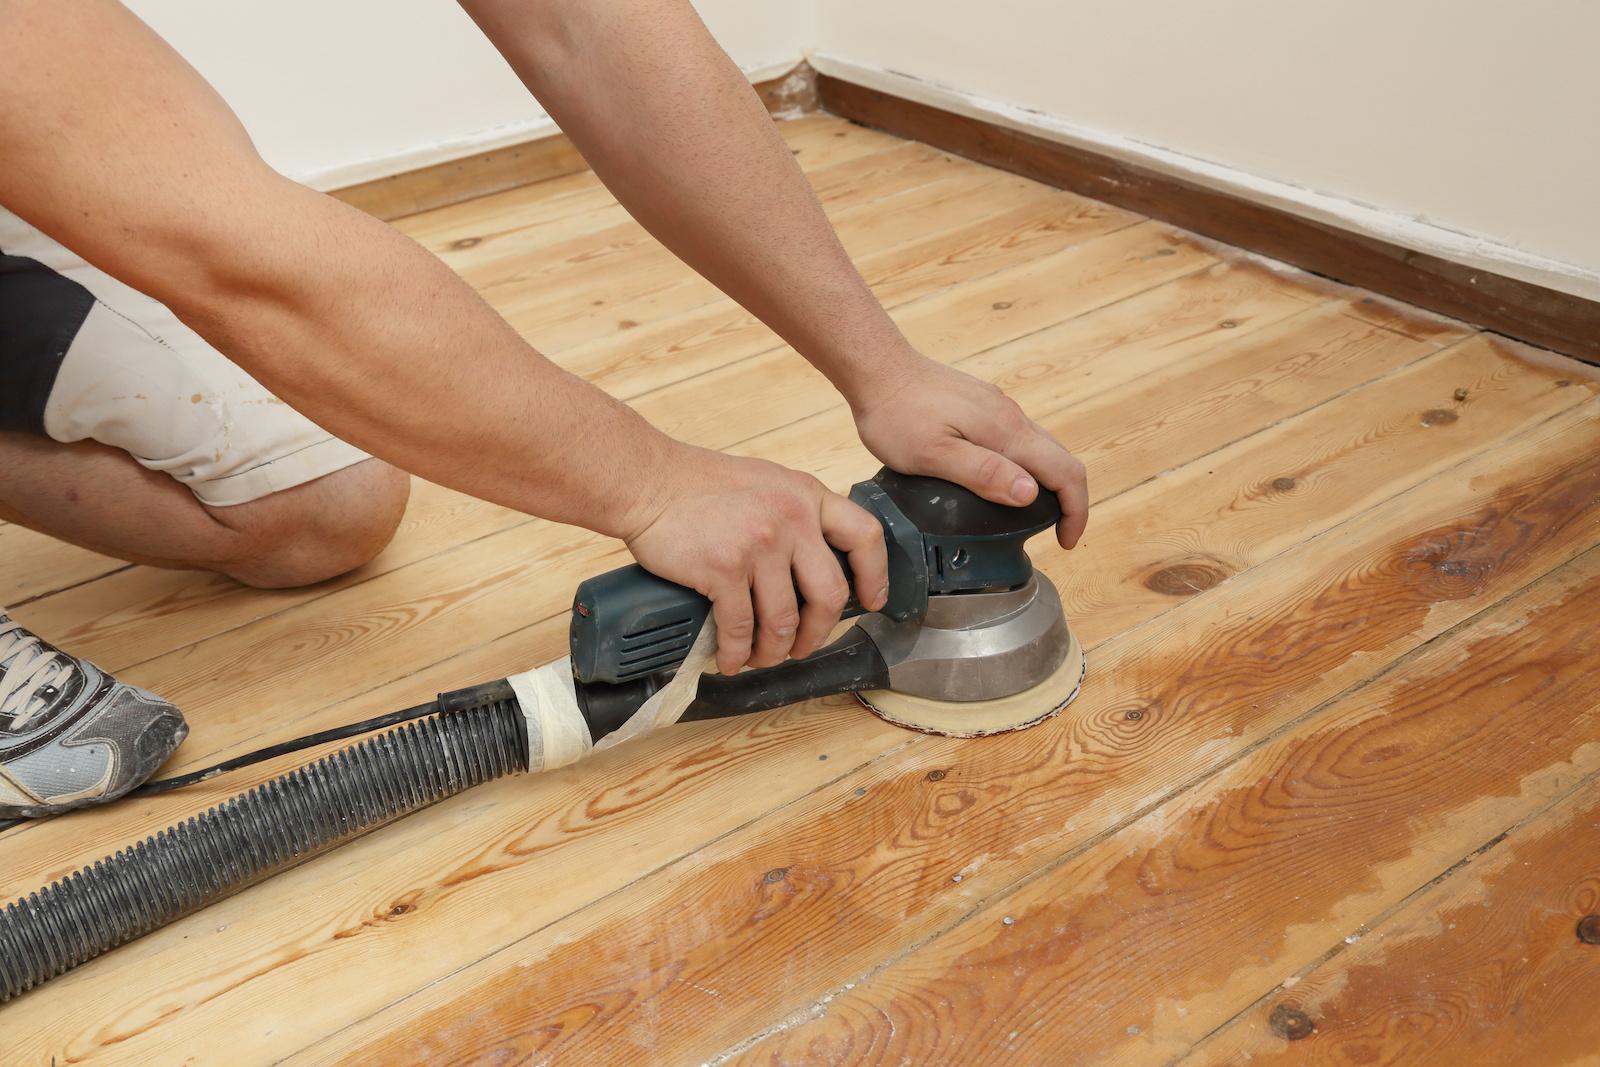 How To Sand Hardwood Floors With An